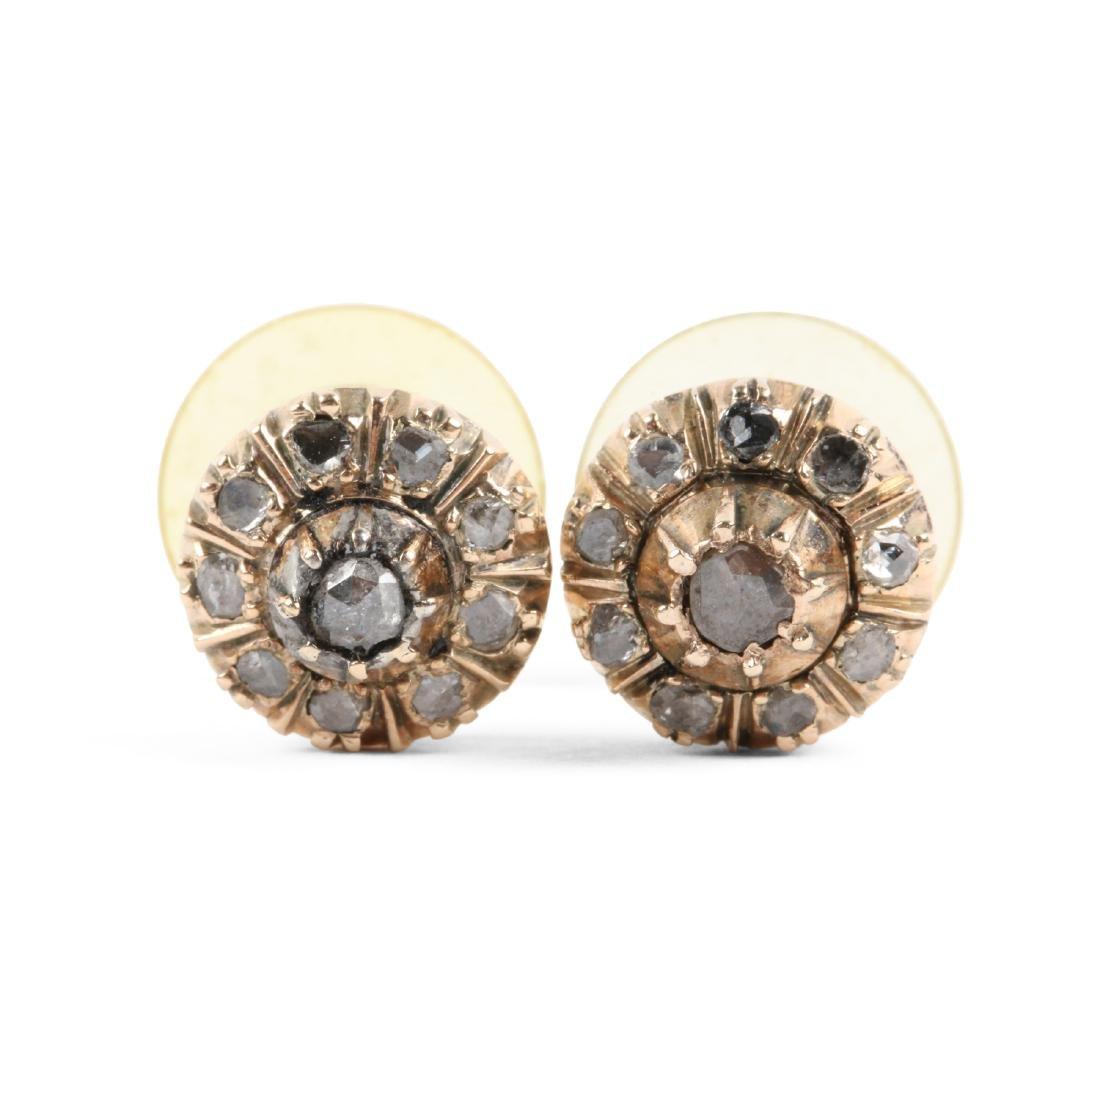 A Pair, 14K Rose Gold & Diamond Earrings